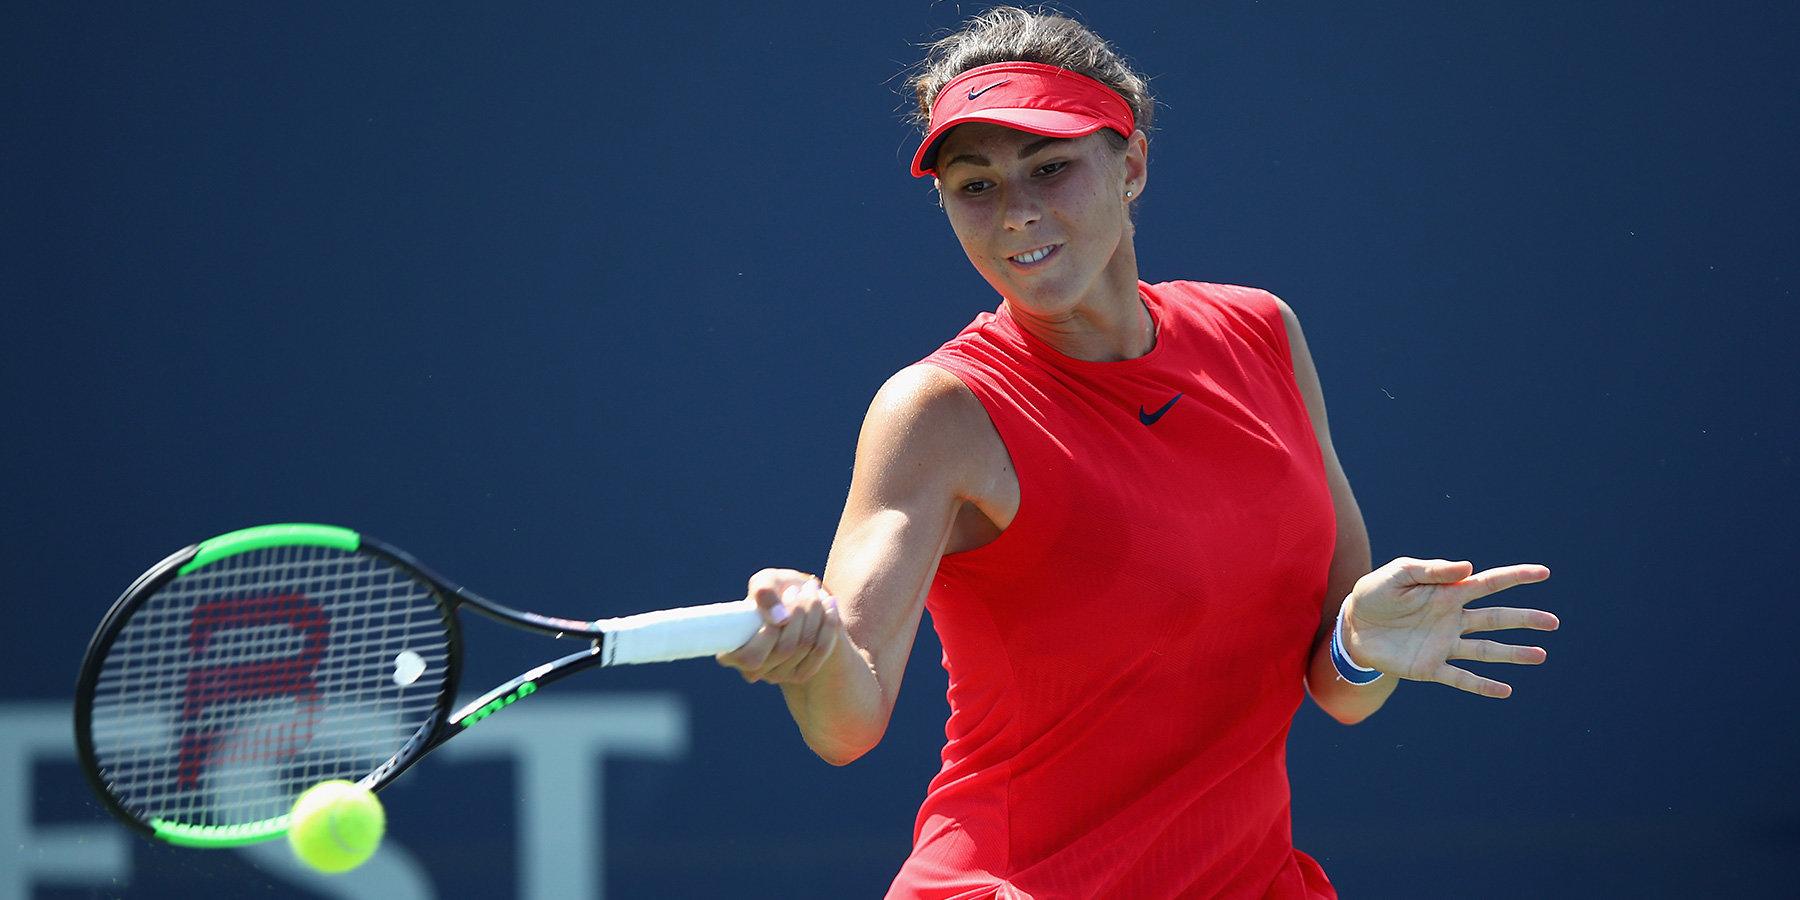 Вихлянцева вышла во второй круг турнира в Лозанне